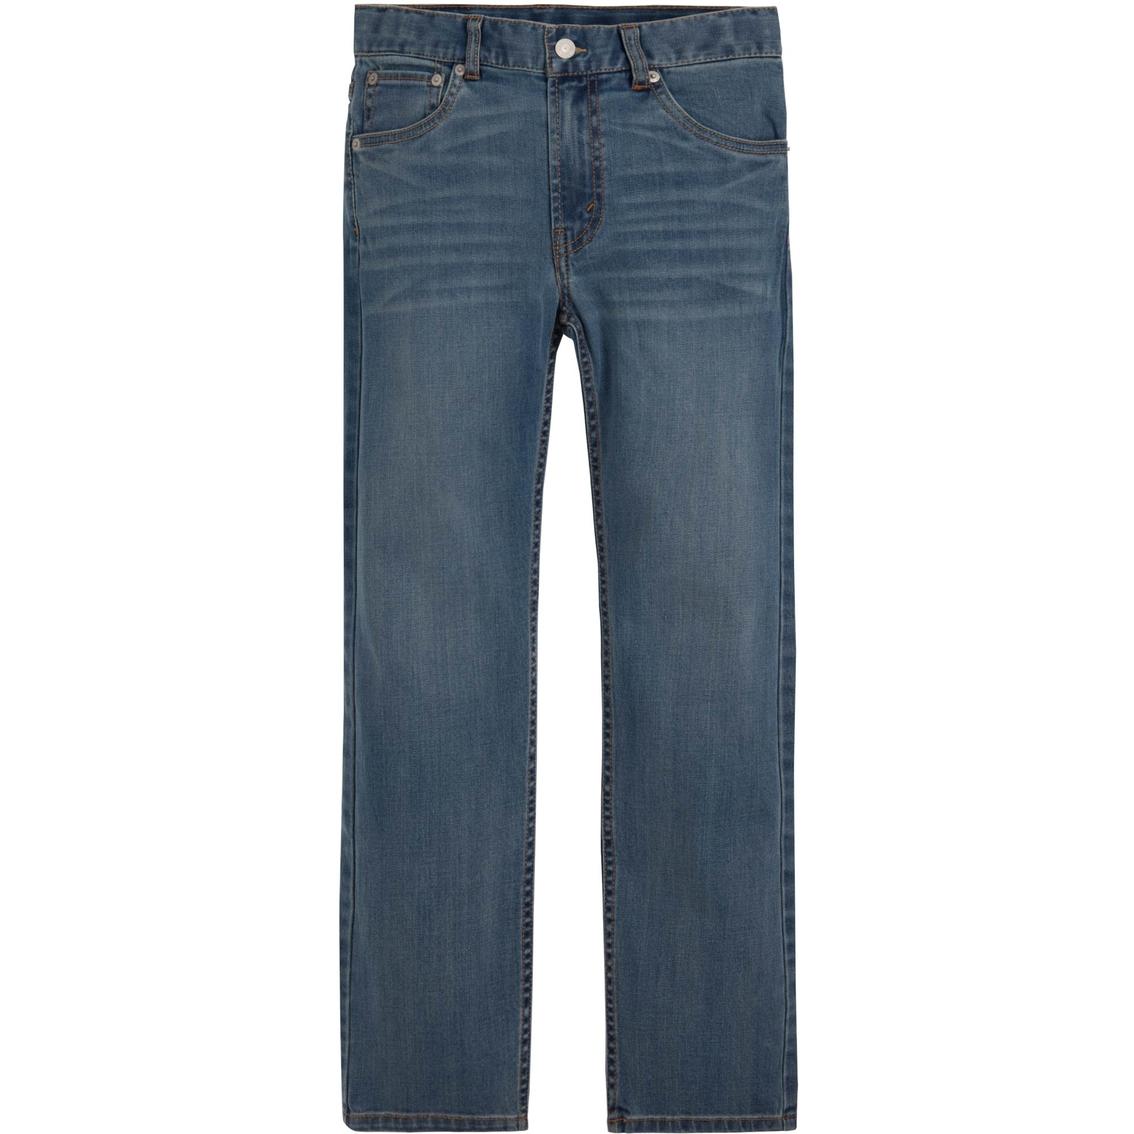 f587212c Levi's Boys 541 Athletic Fit Jeans   Boys 8-20   Apparel   Shop The ...